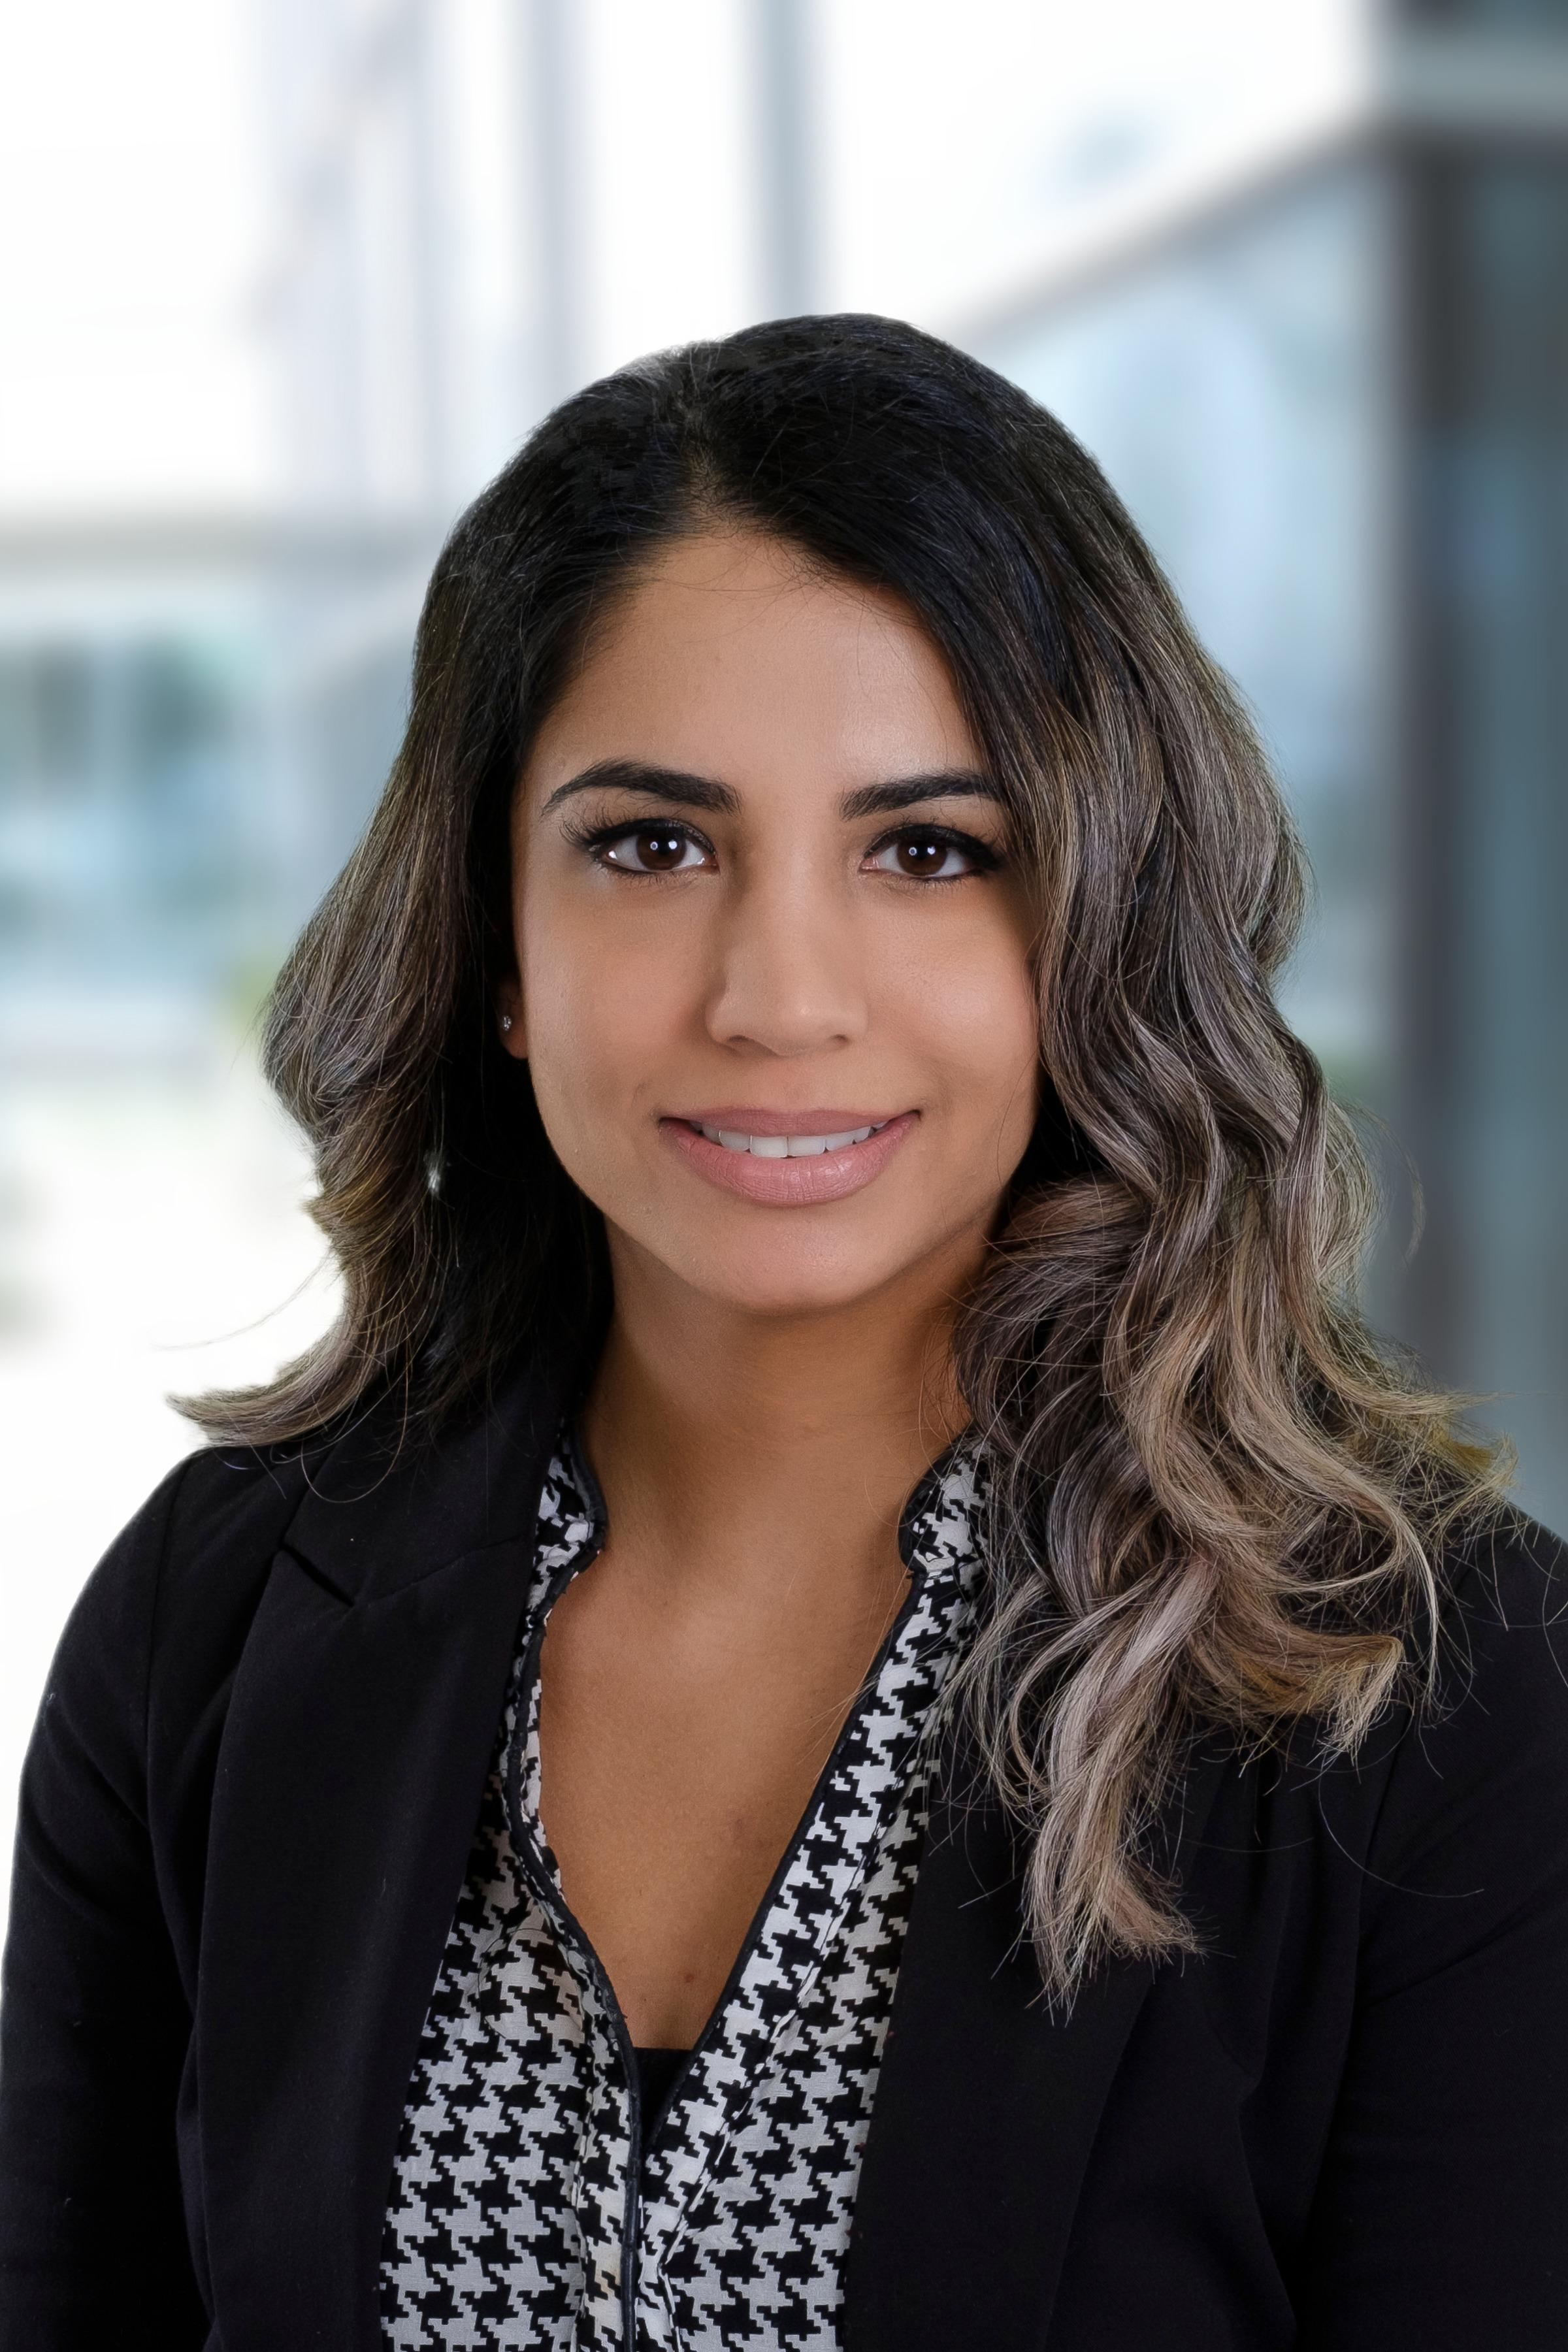 Sonia-Riarh-Marketing-Coordinator Our Team